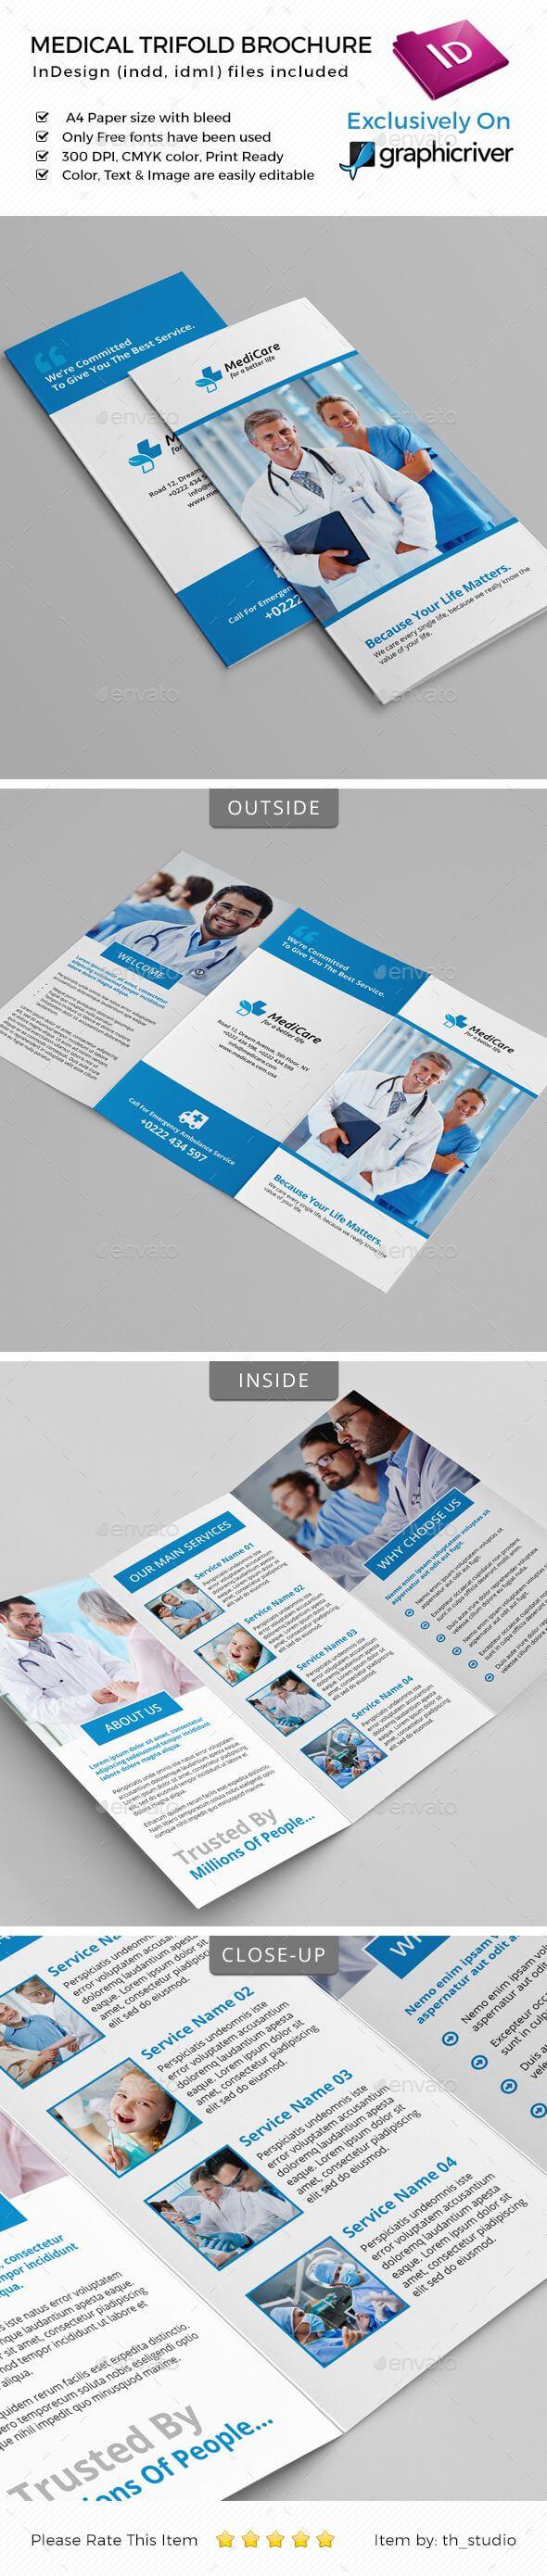 Medical Trifold Brochure | Brochure Templates | Travel within Medical Office Brochure Templates